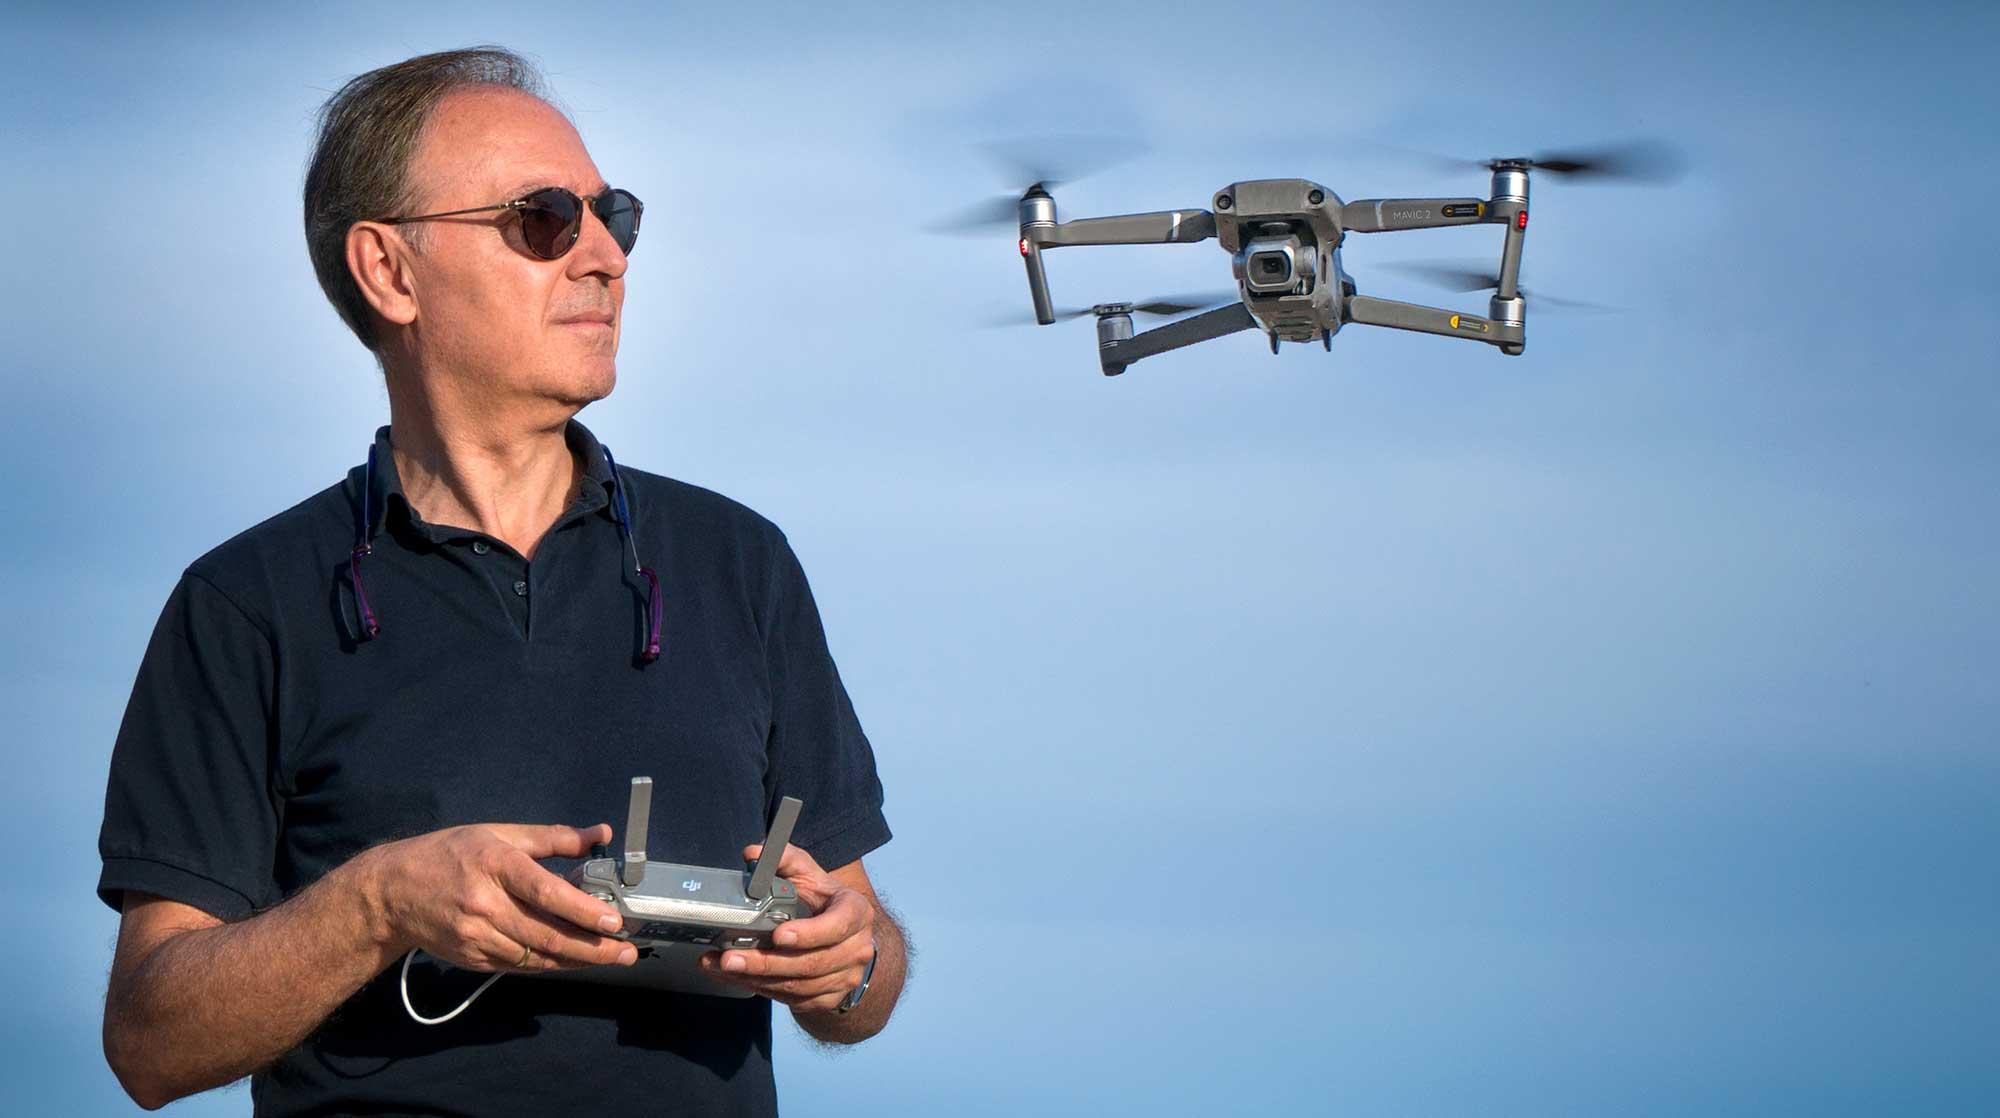 Miguel-Merino-volando-un-dron-dji-mavic-2-pro